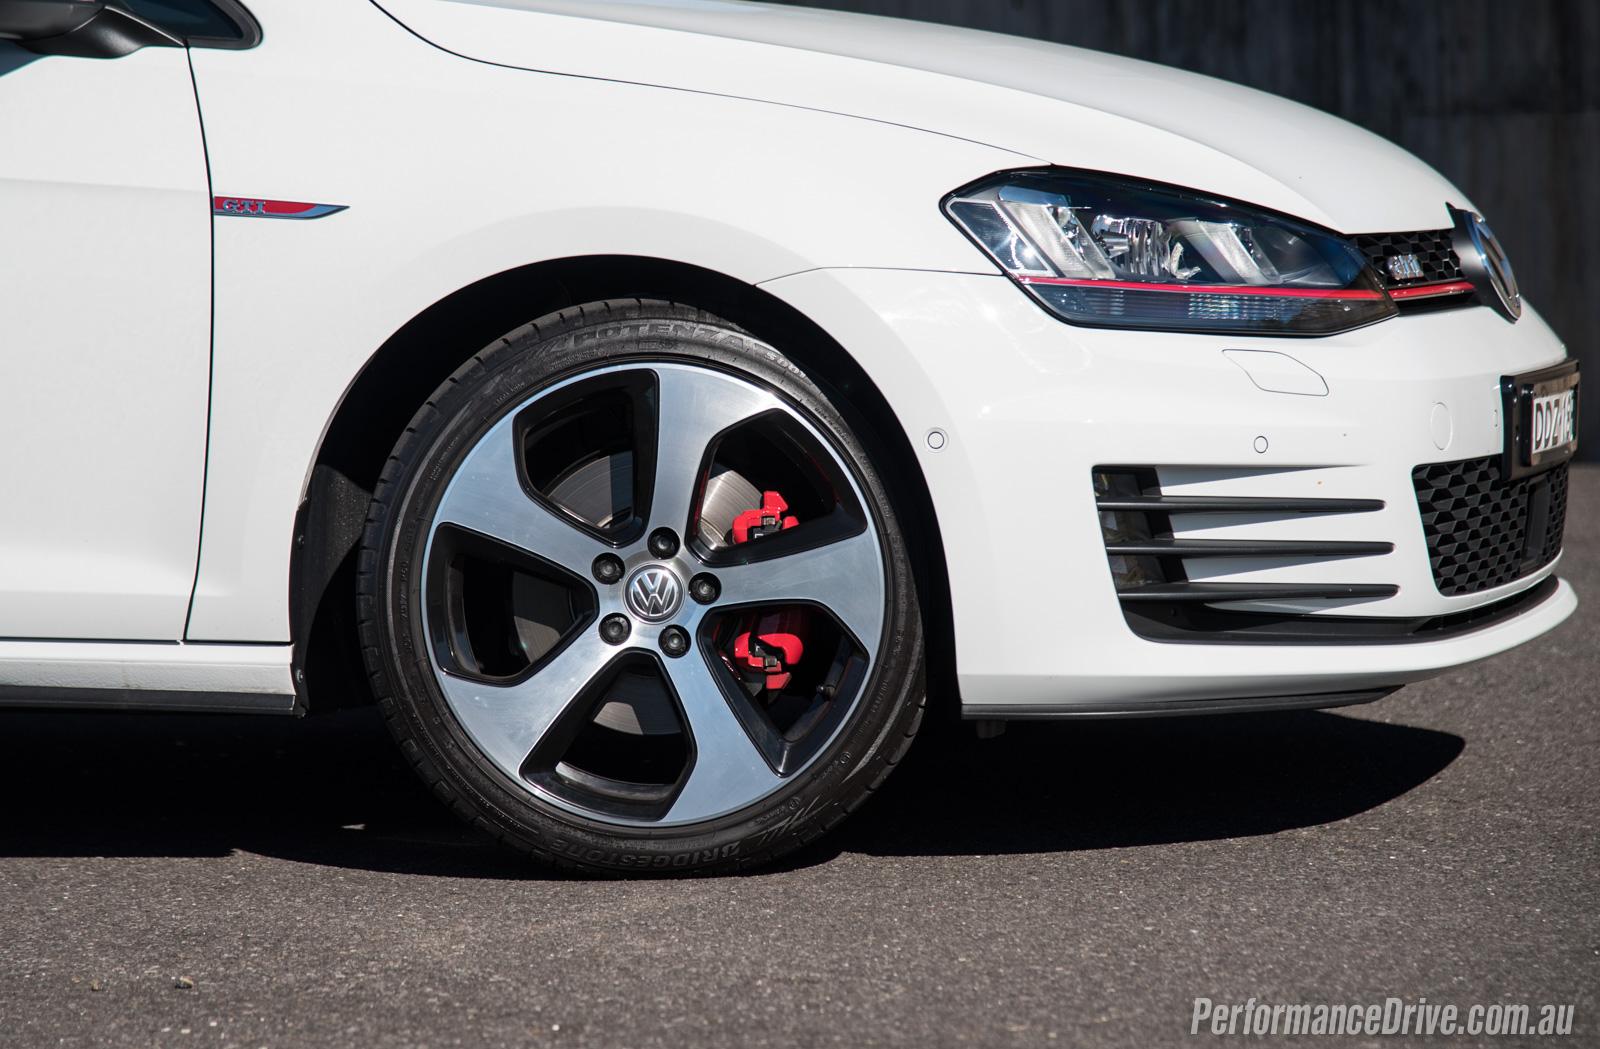 2016 Volkswagen Golf Gti Review Video Performancedrive